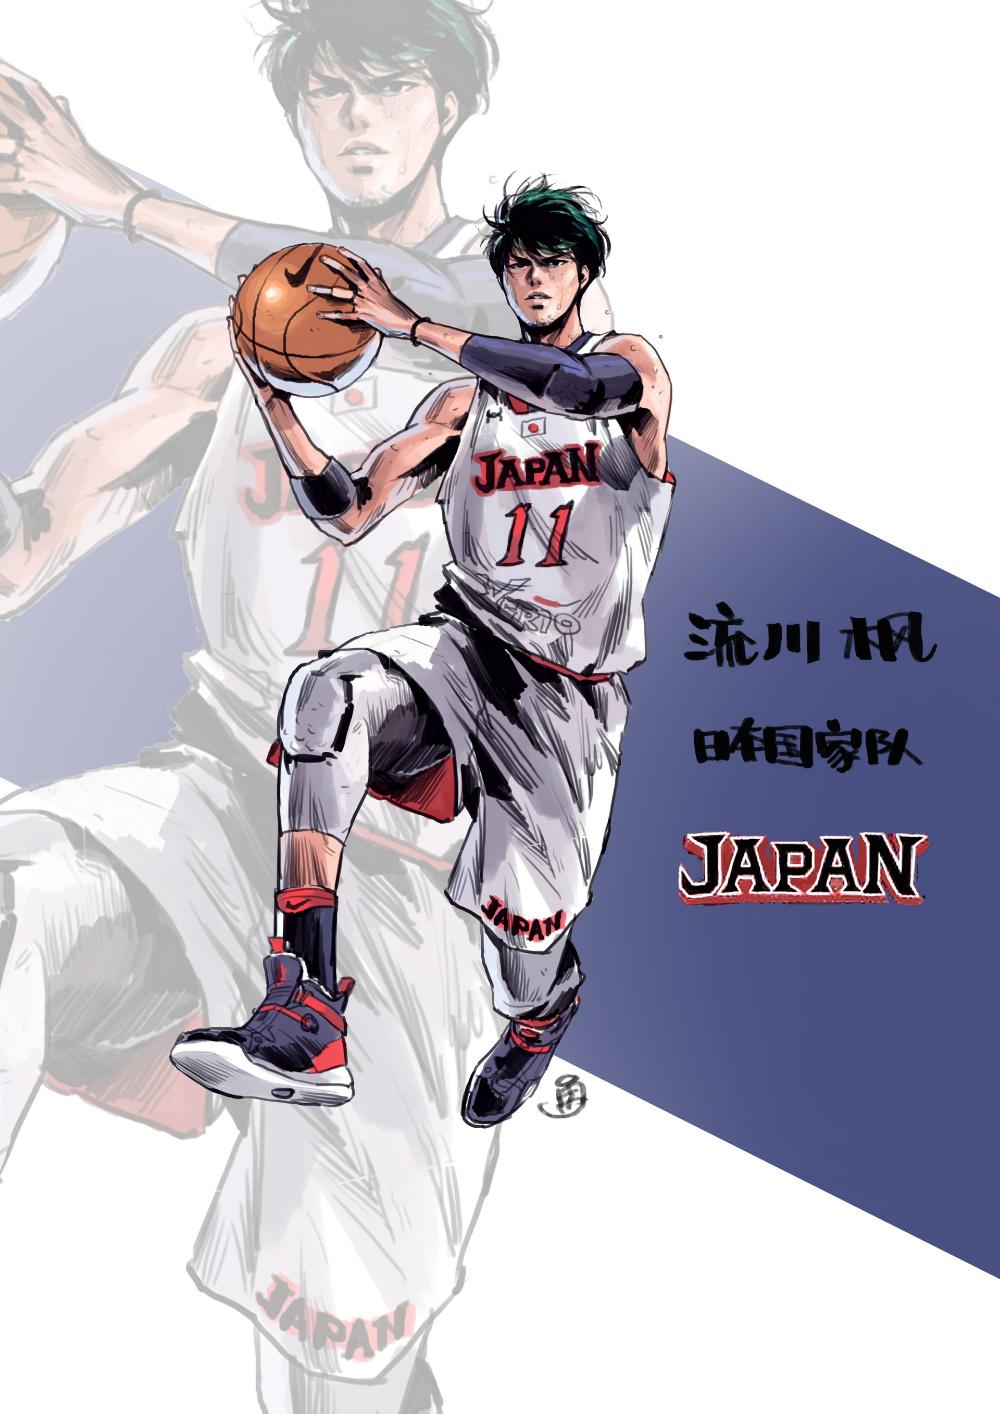 Kaeda Rukawa At Team Japan By Yong Li In 2020 Slam Dunk Anime Slam Dunk Manga Slam Dunk